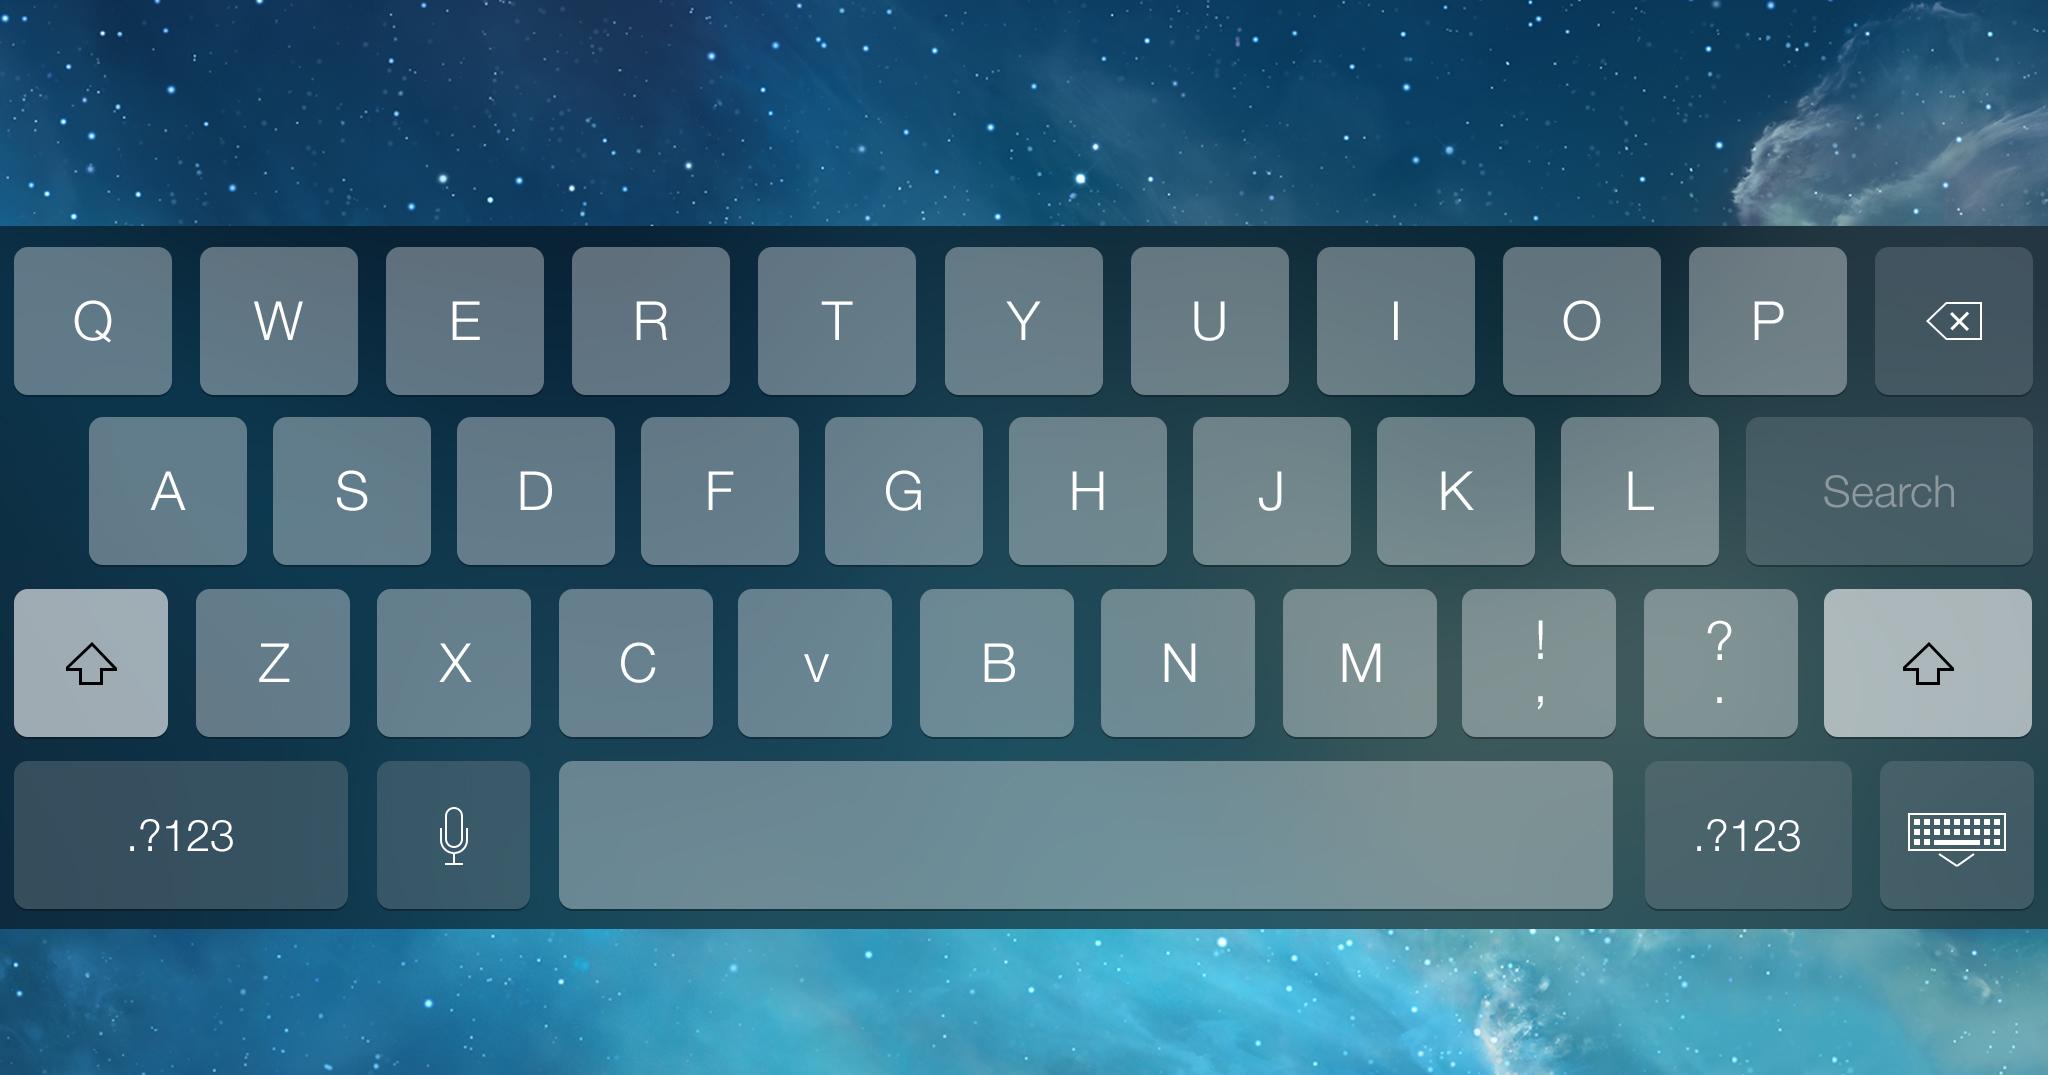 Free-Dark keyboard for iOS 7 mockups psd